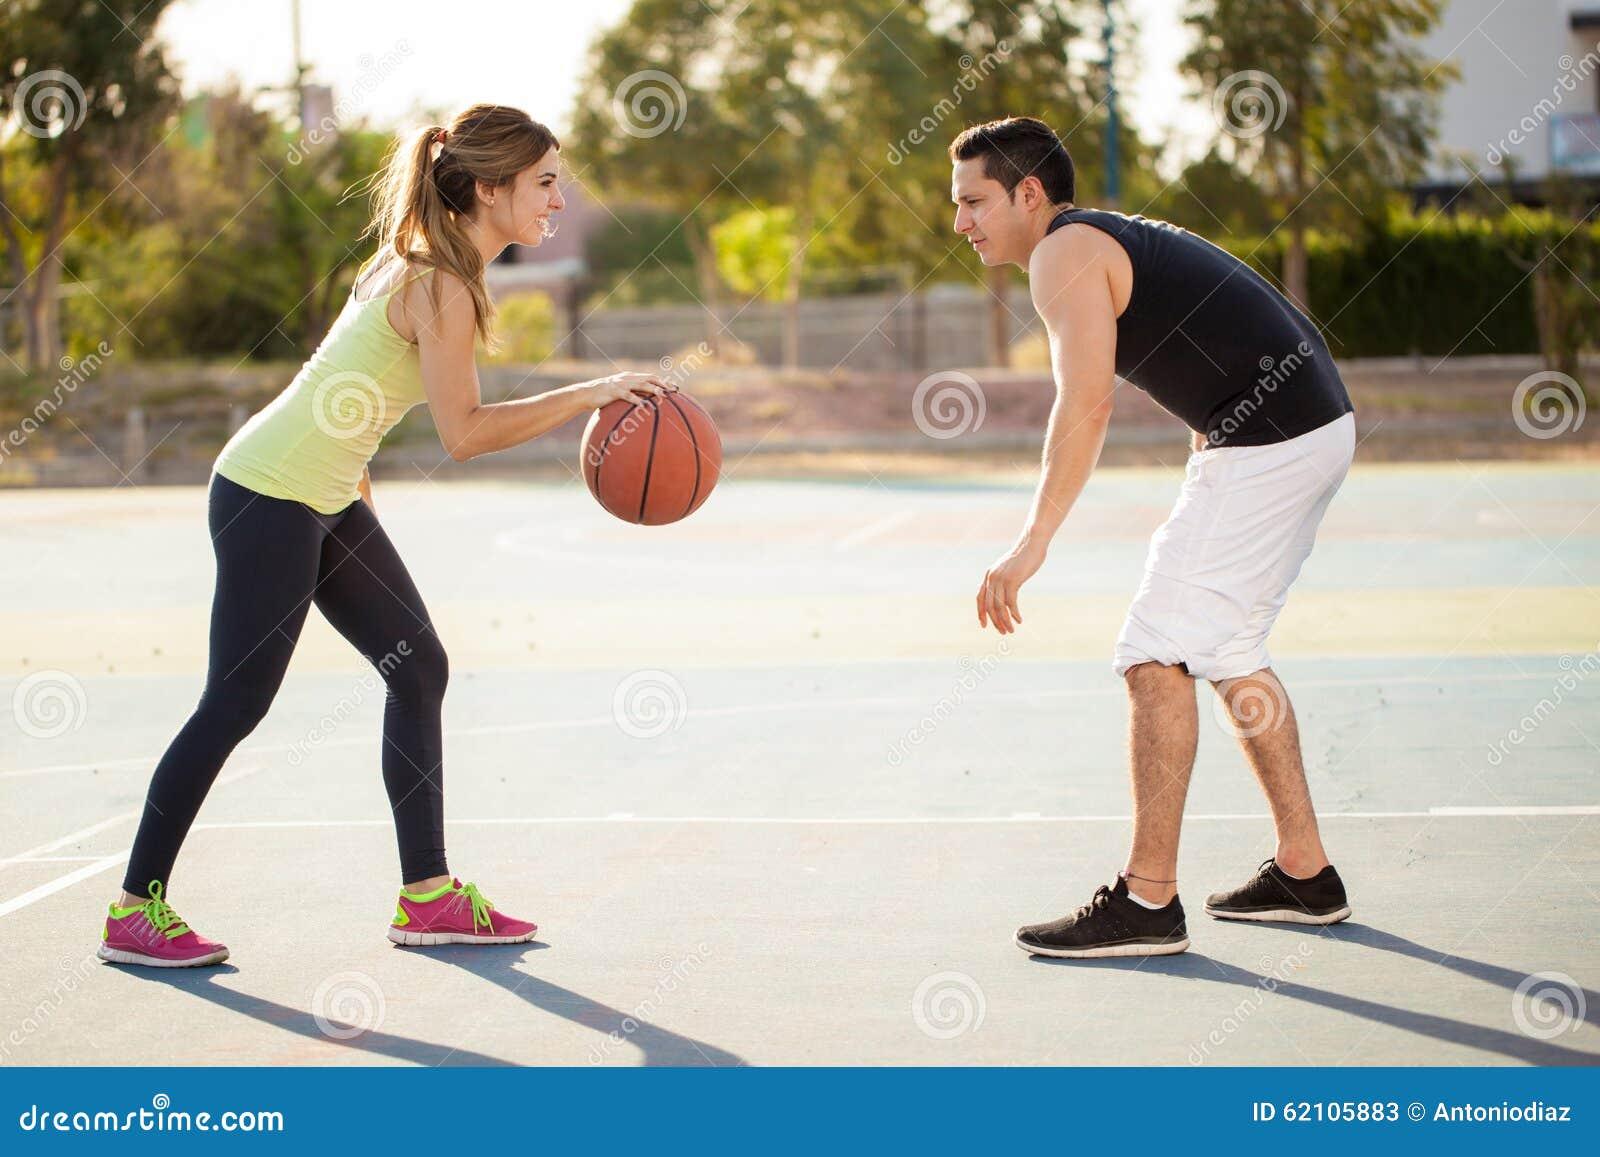 Couple Playing Basketball Outdoors Stock Image Image Of Female